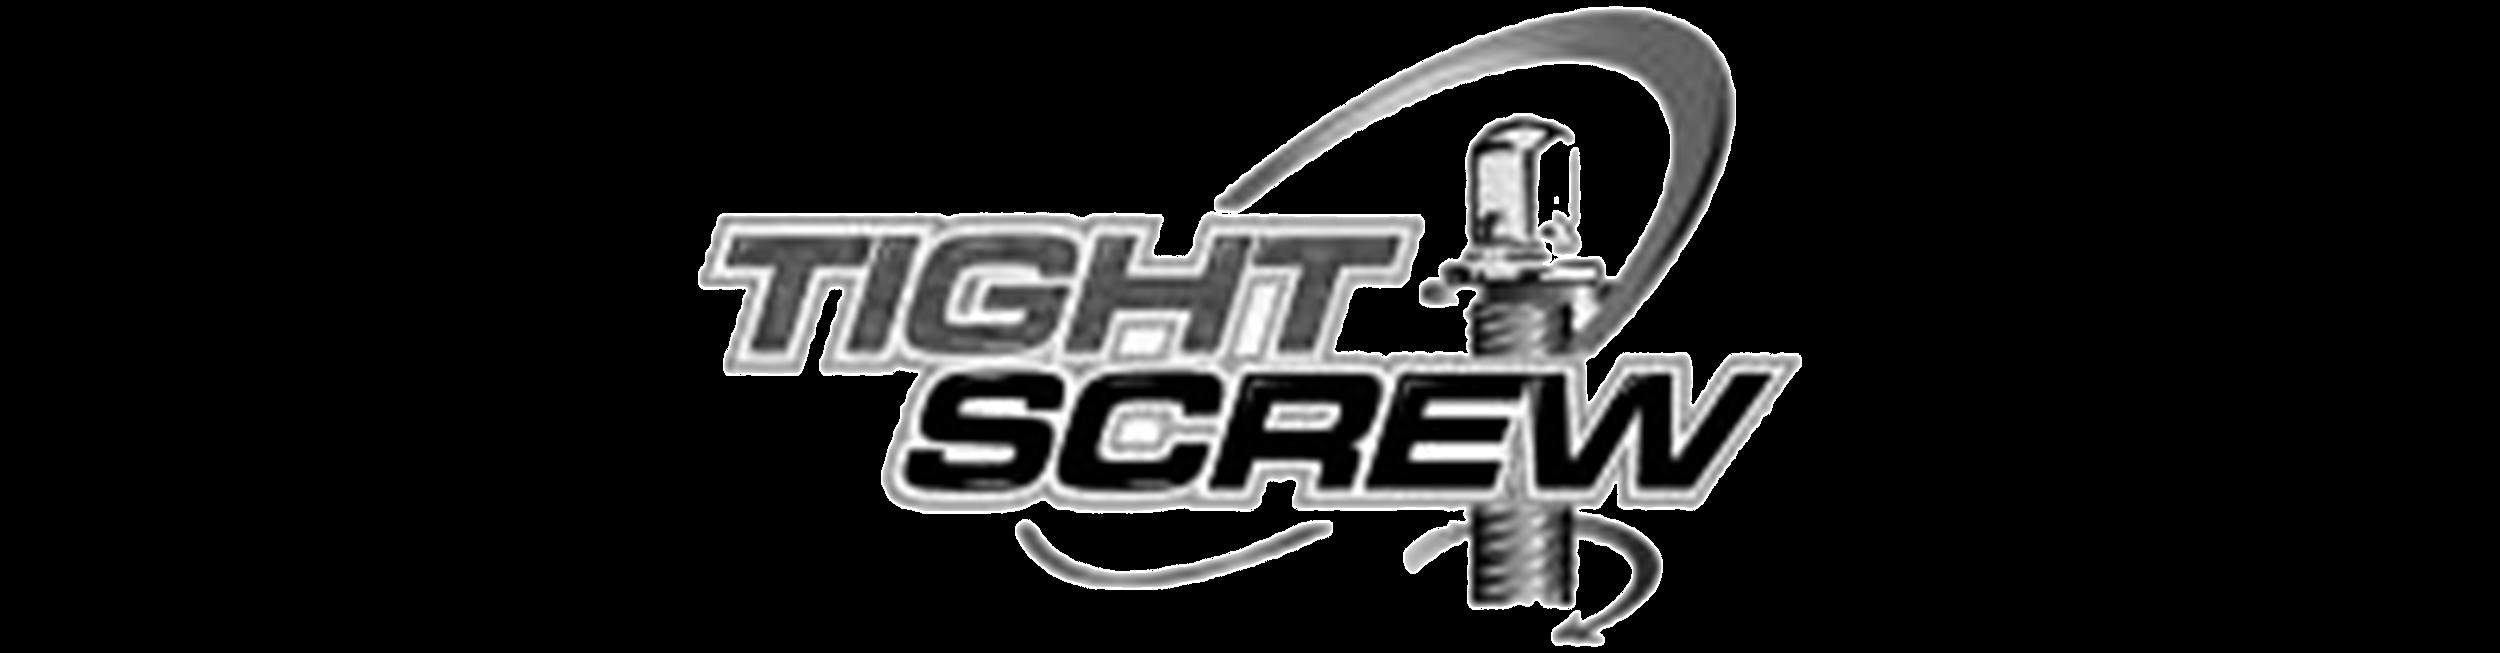 Productos - TIGHT SCREW